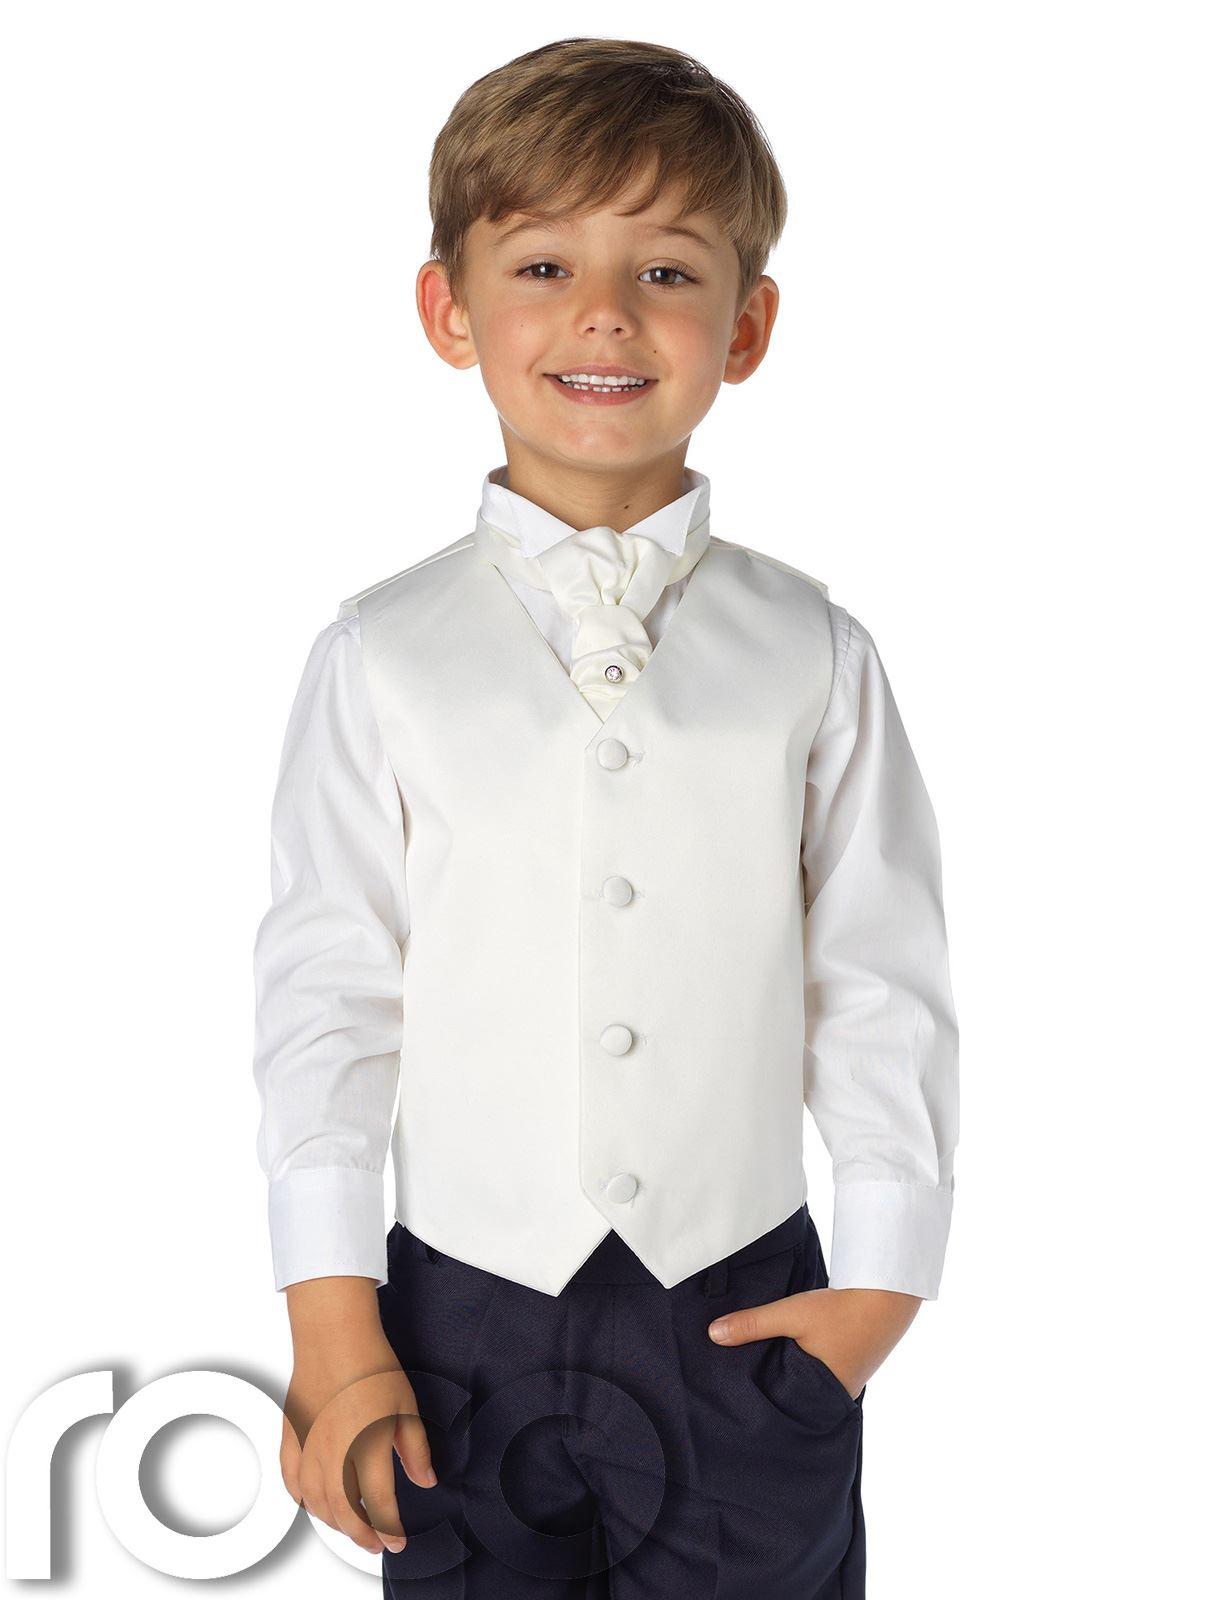 Boys Waistcoat Suit, Page Boys Suits, Boys Wedding Suit, Navy ...